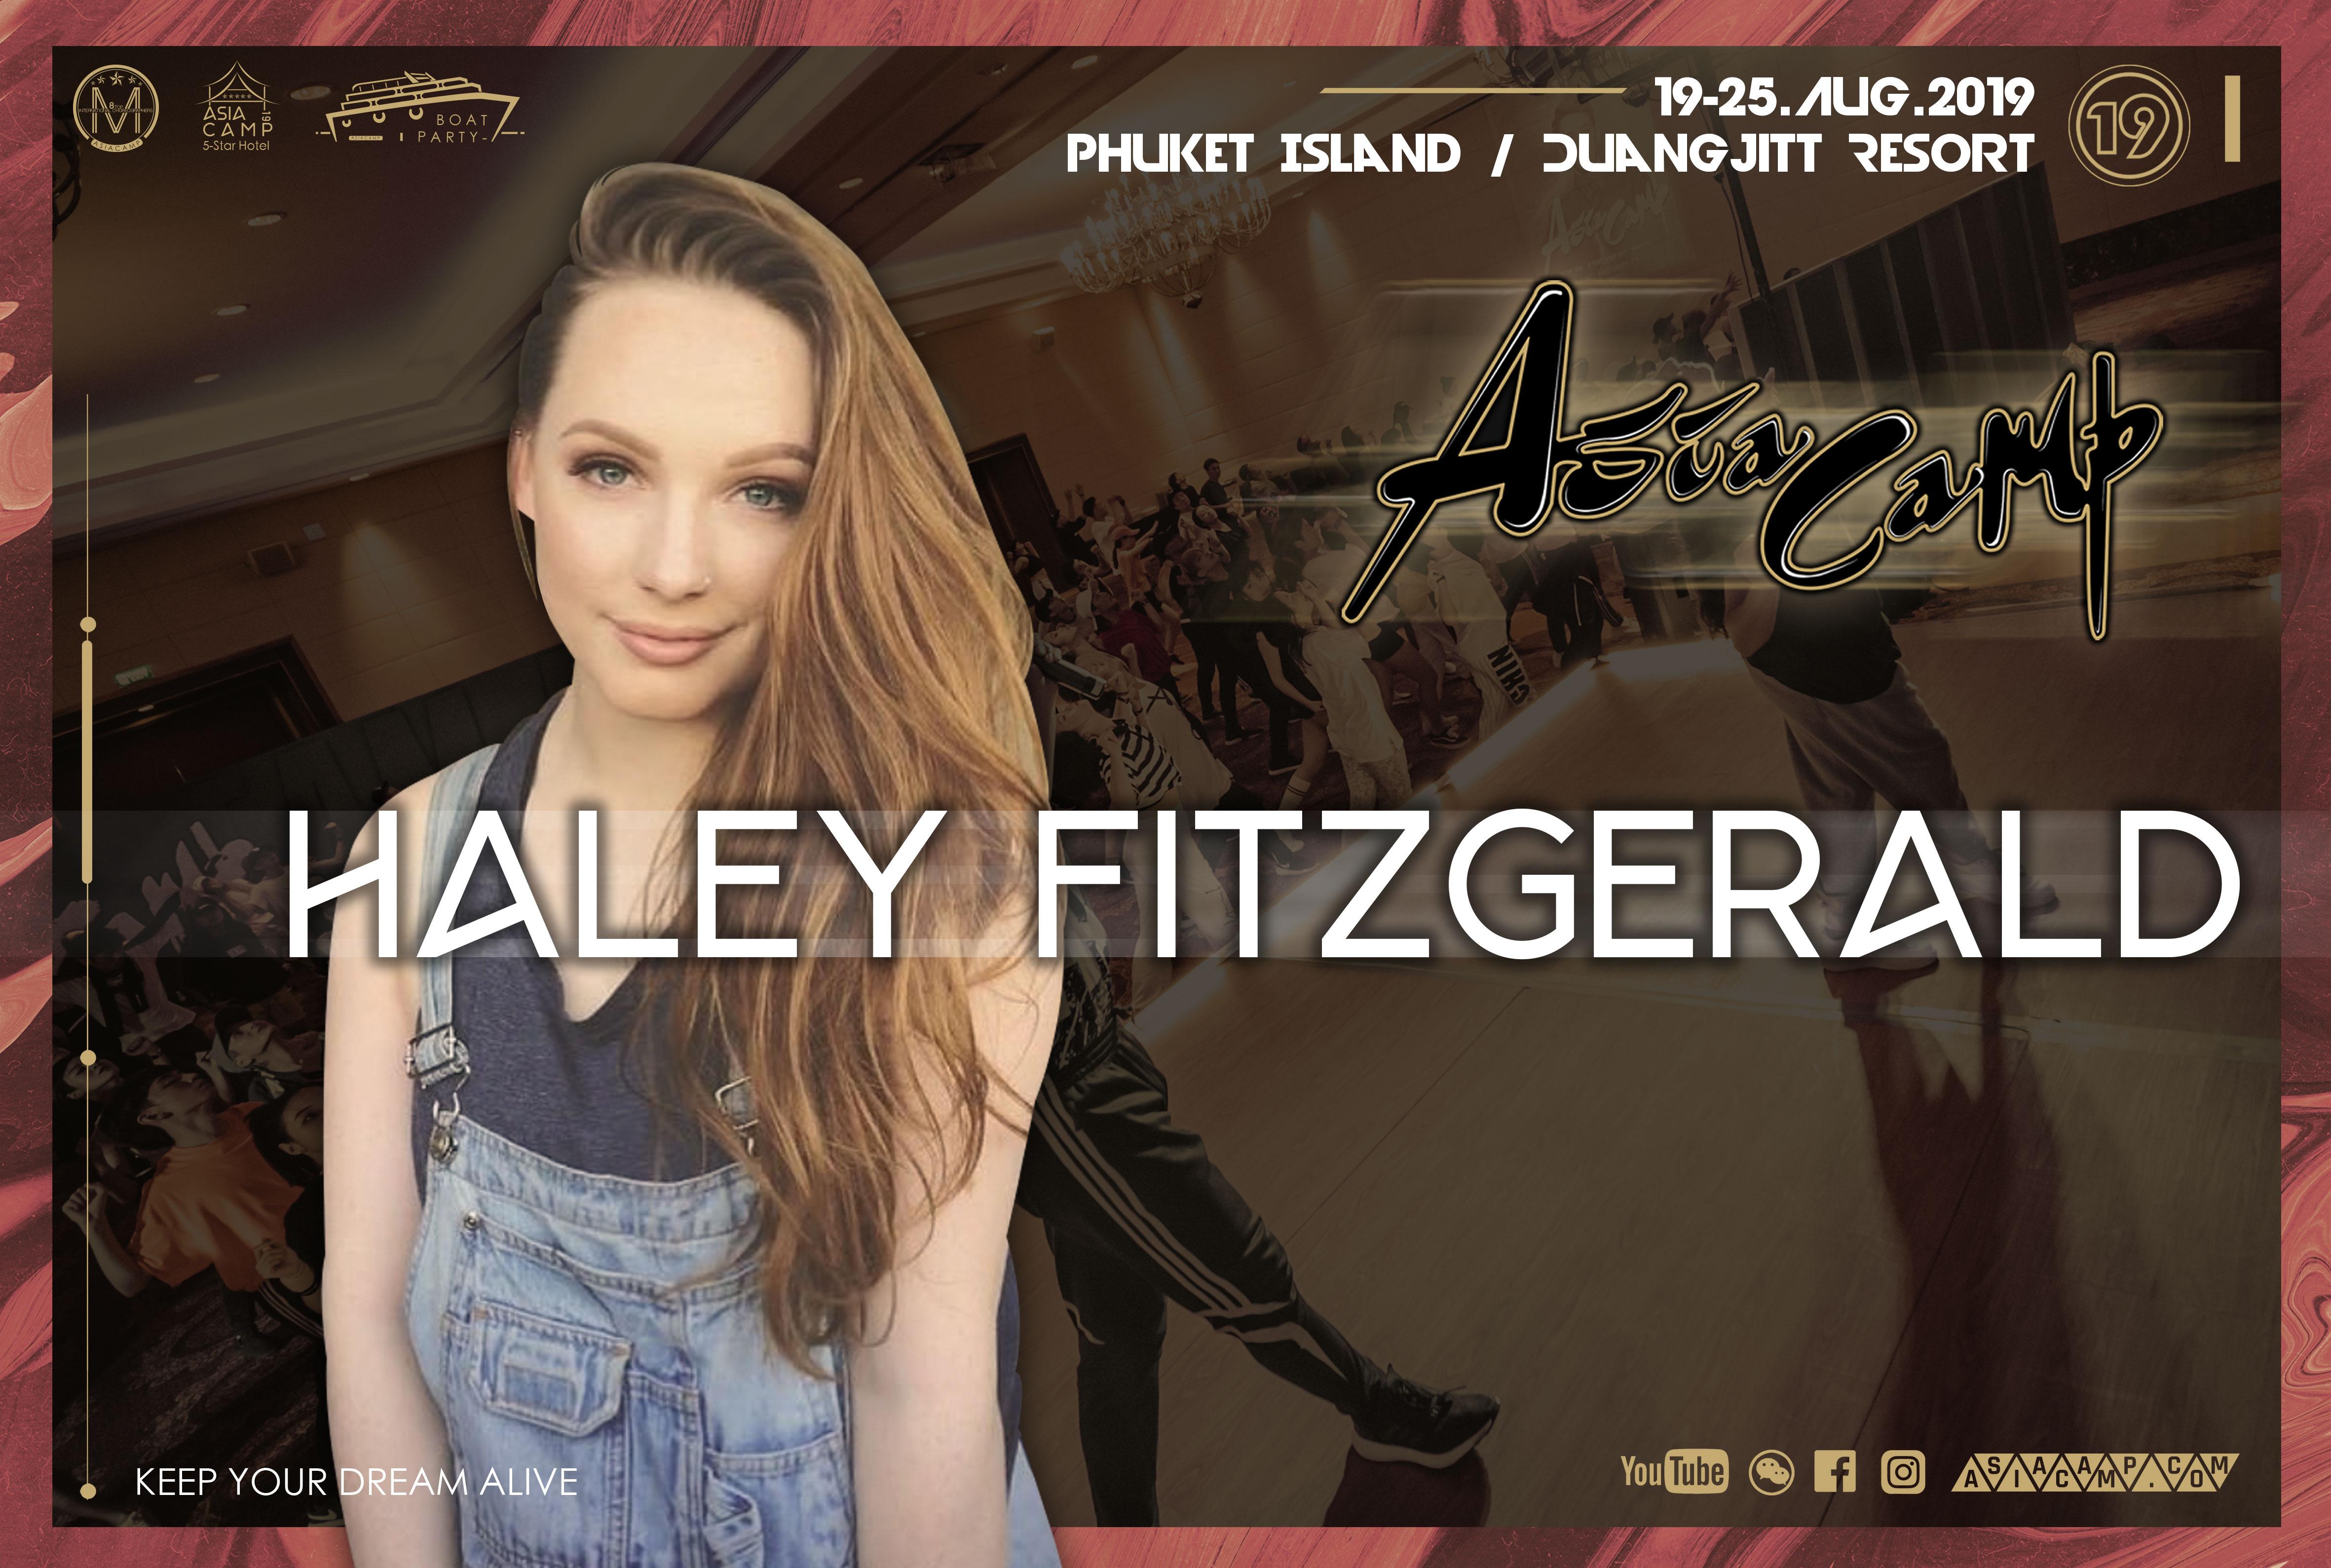 Haley-Fitzgerald 红色